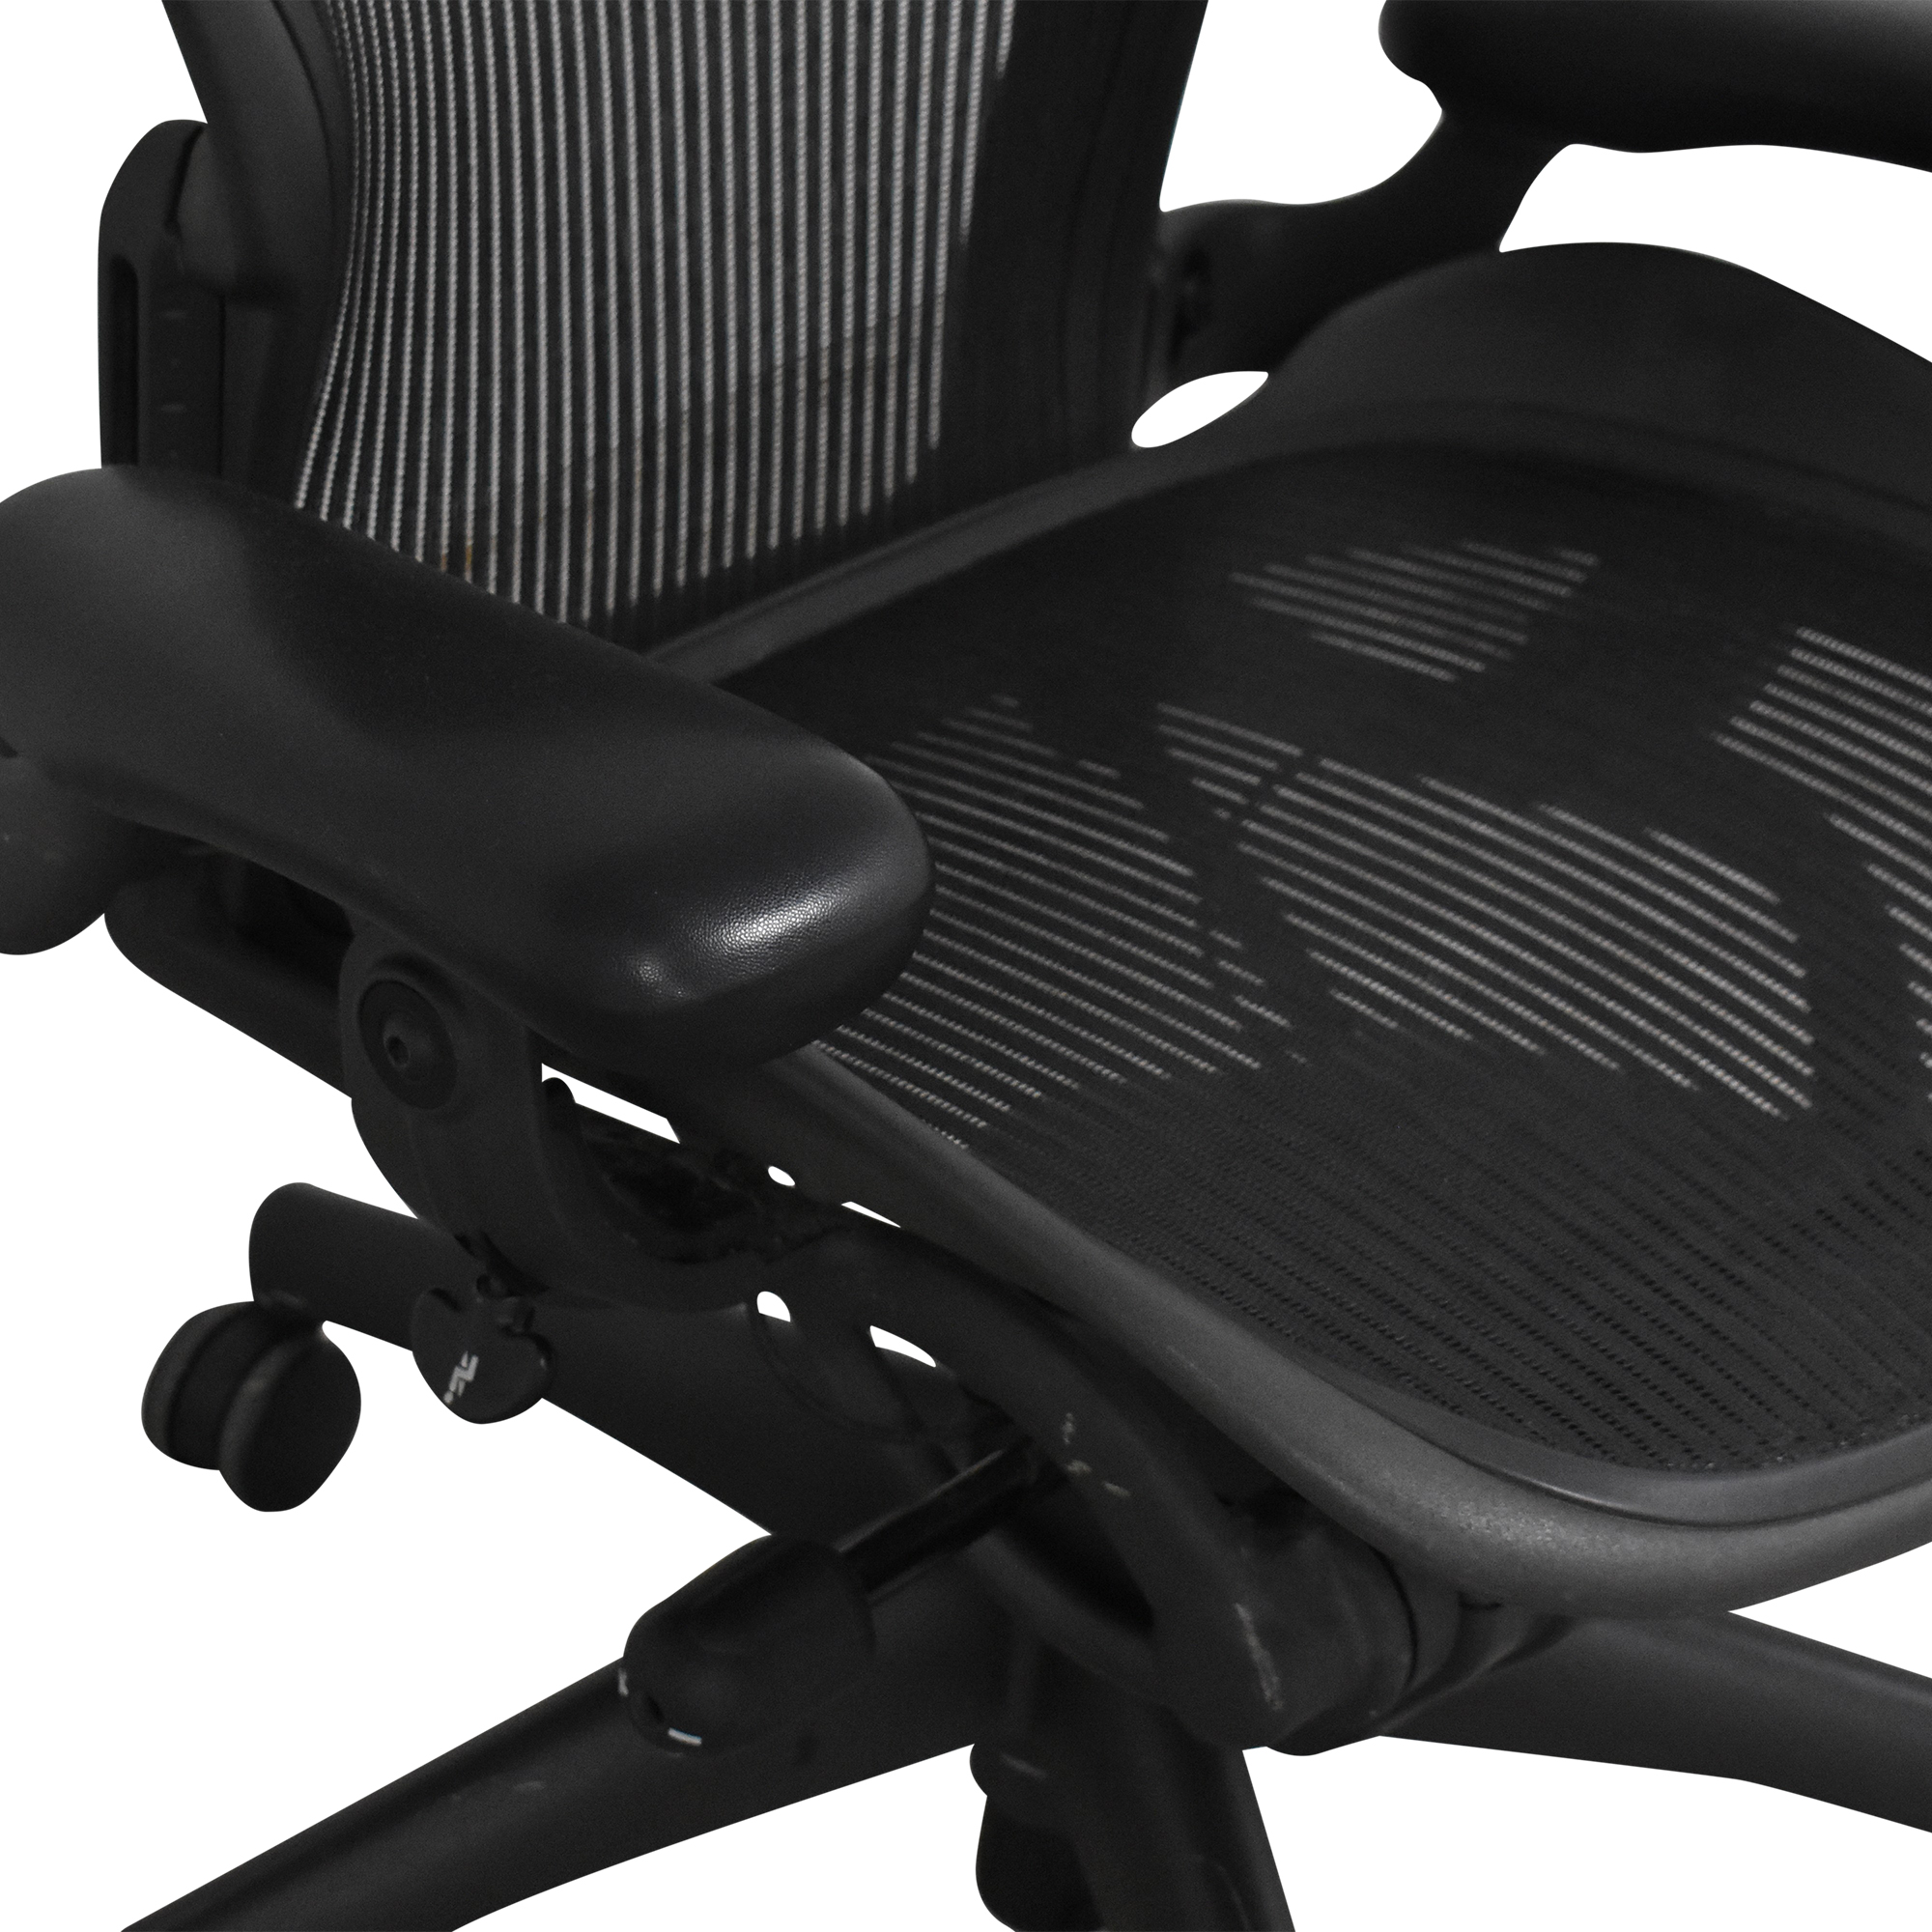 Herman Miller Herman Miller Aeron Size B Swivel Desk Chair dimensions